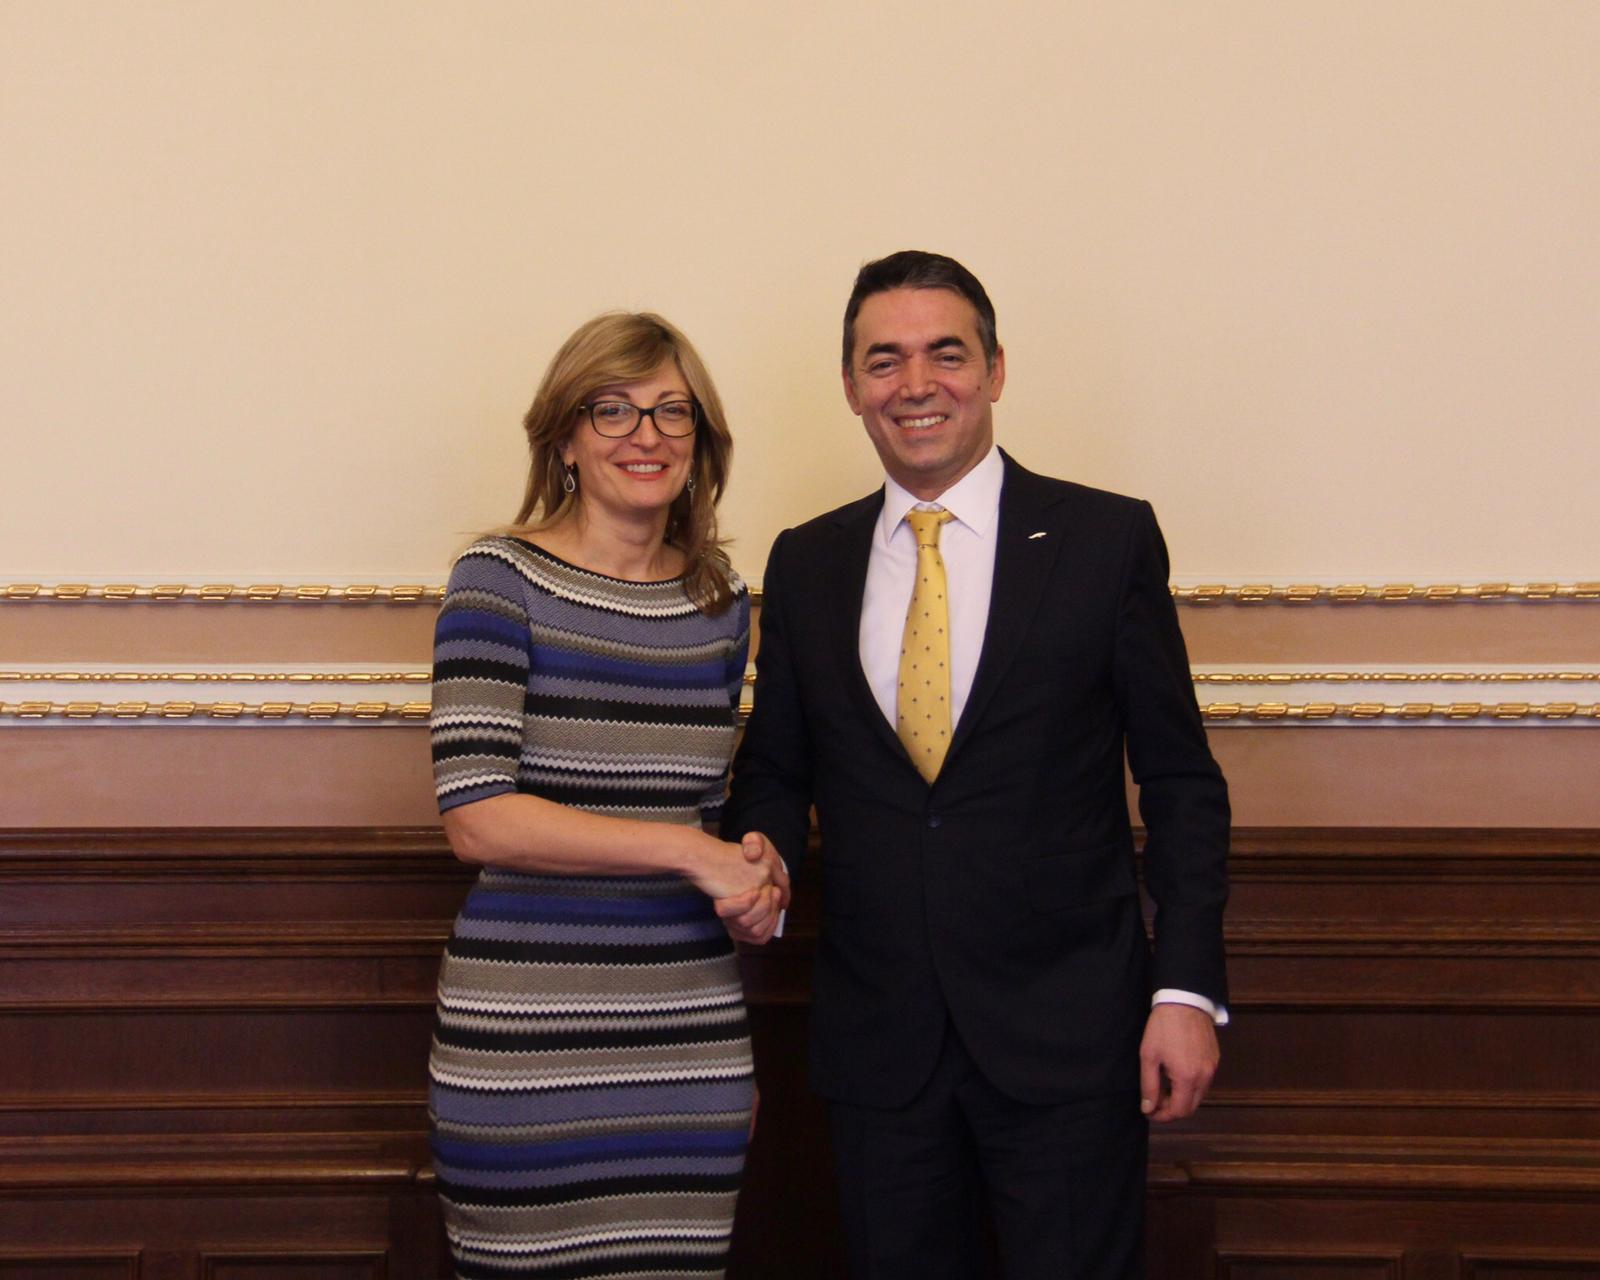 Zaharieva και Dimitrov συναντήθηκαν στο Βουκουρέστι